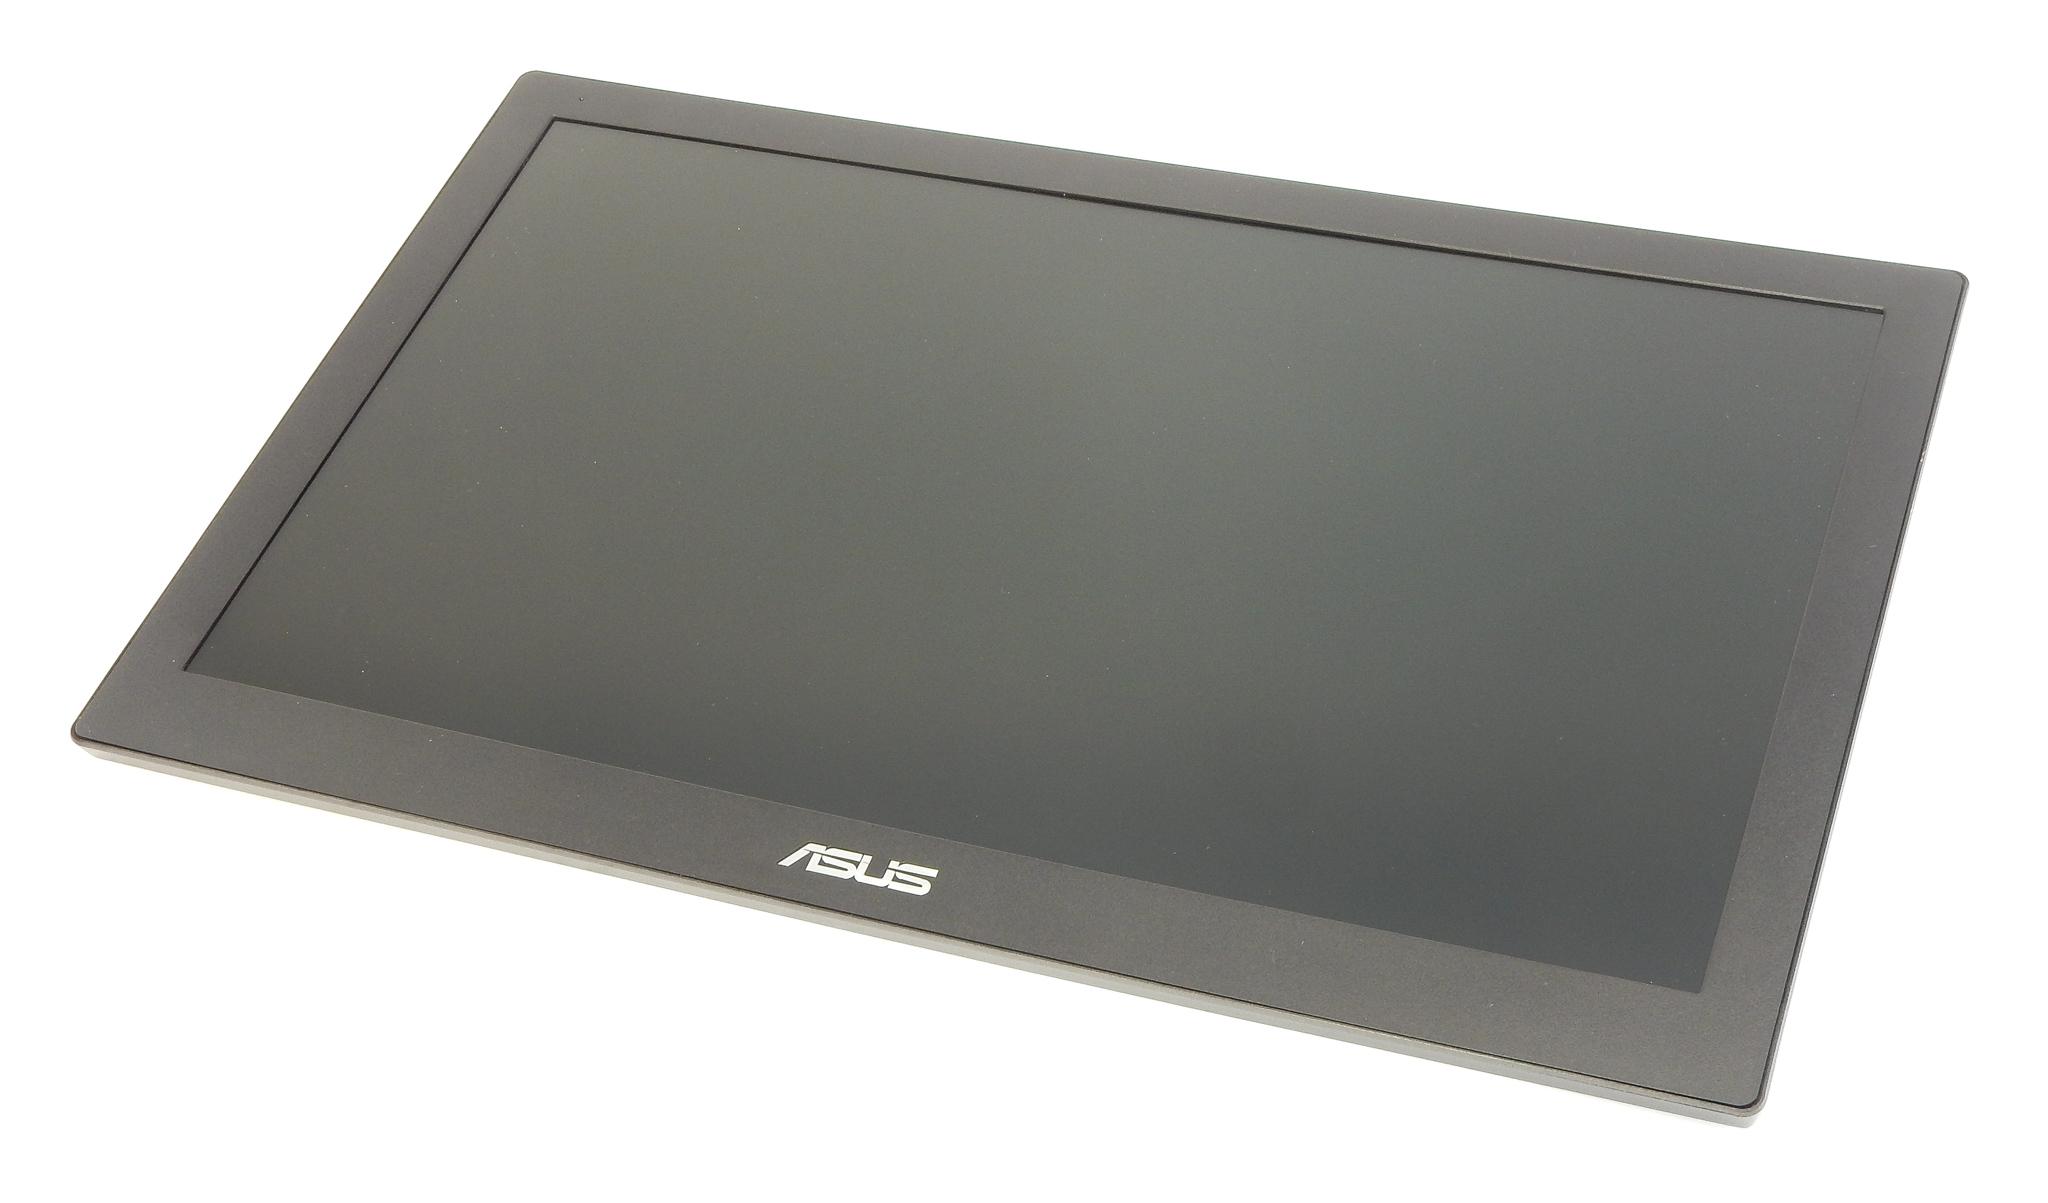 Asus MB168B Portable USB 15.6 inch HD Monitor /USB-powered / Ultra-slim